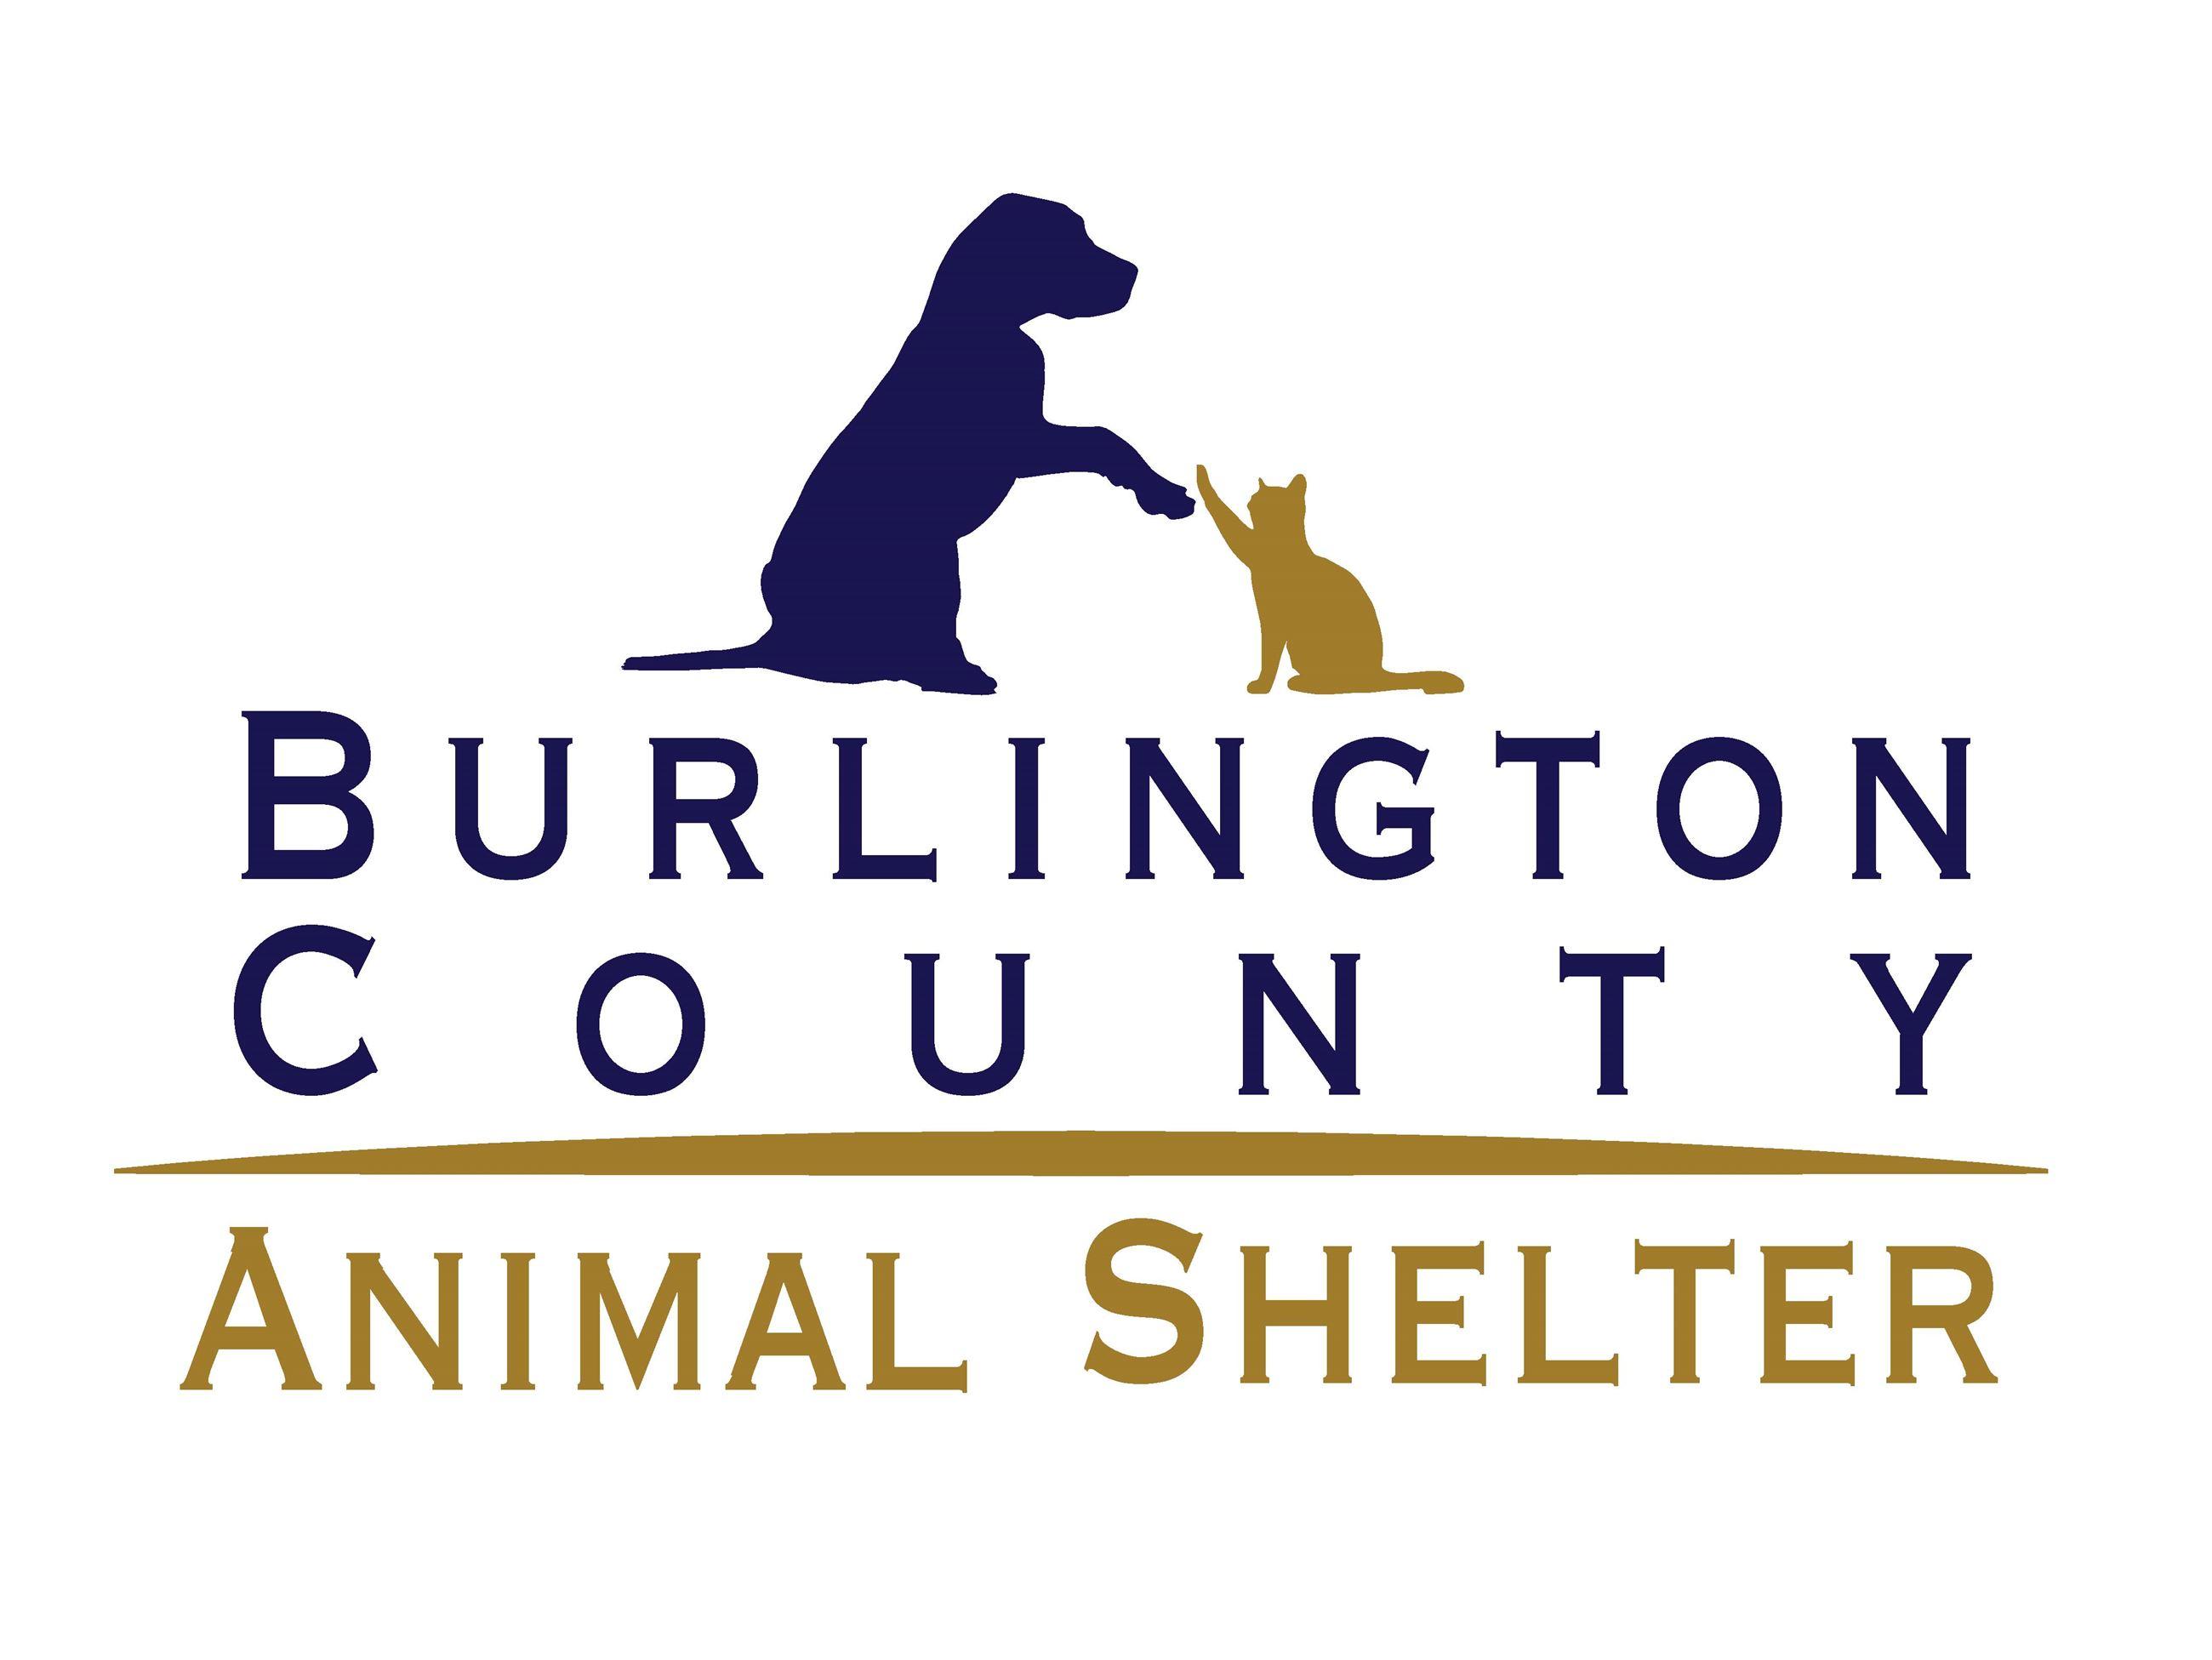 Animal Shelter | Burlington County, NJ - Official Website